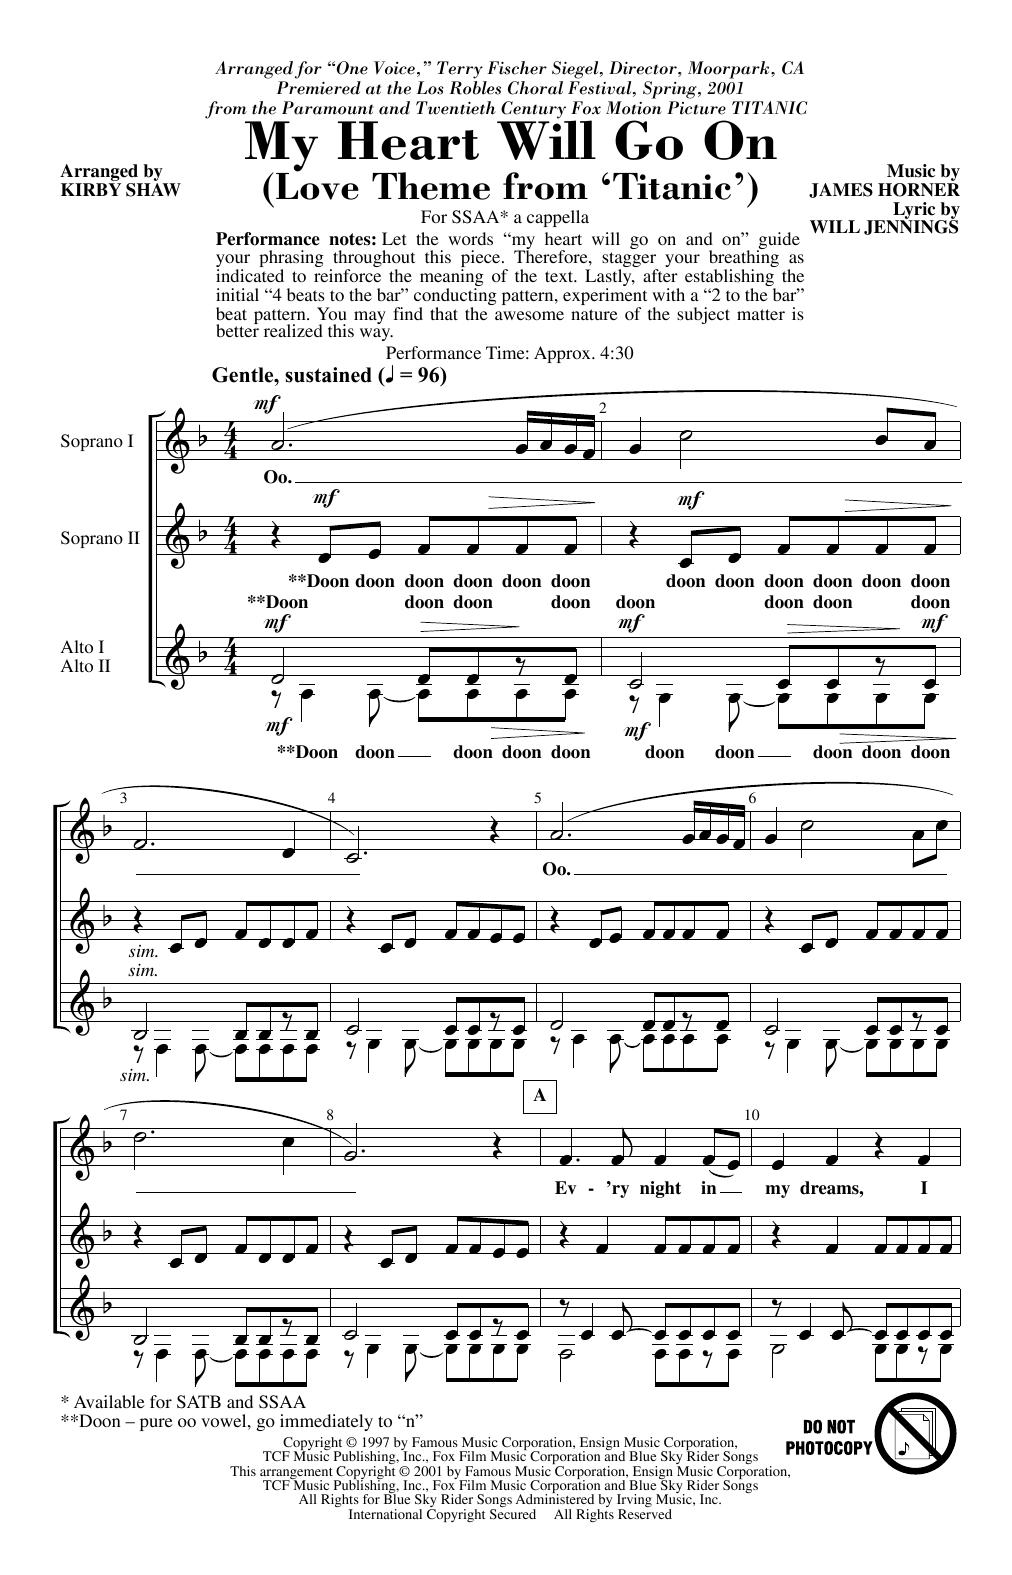 My Heart Will Go On (Love Theme From Titanic) (arr. Kirby Shaw) (SSA Choir)